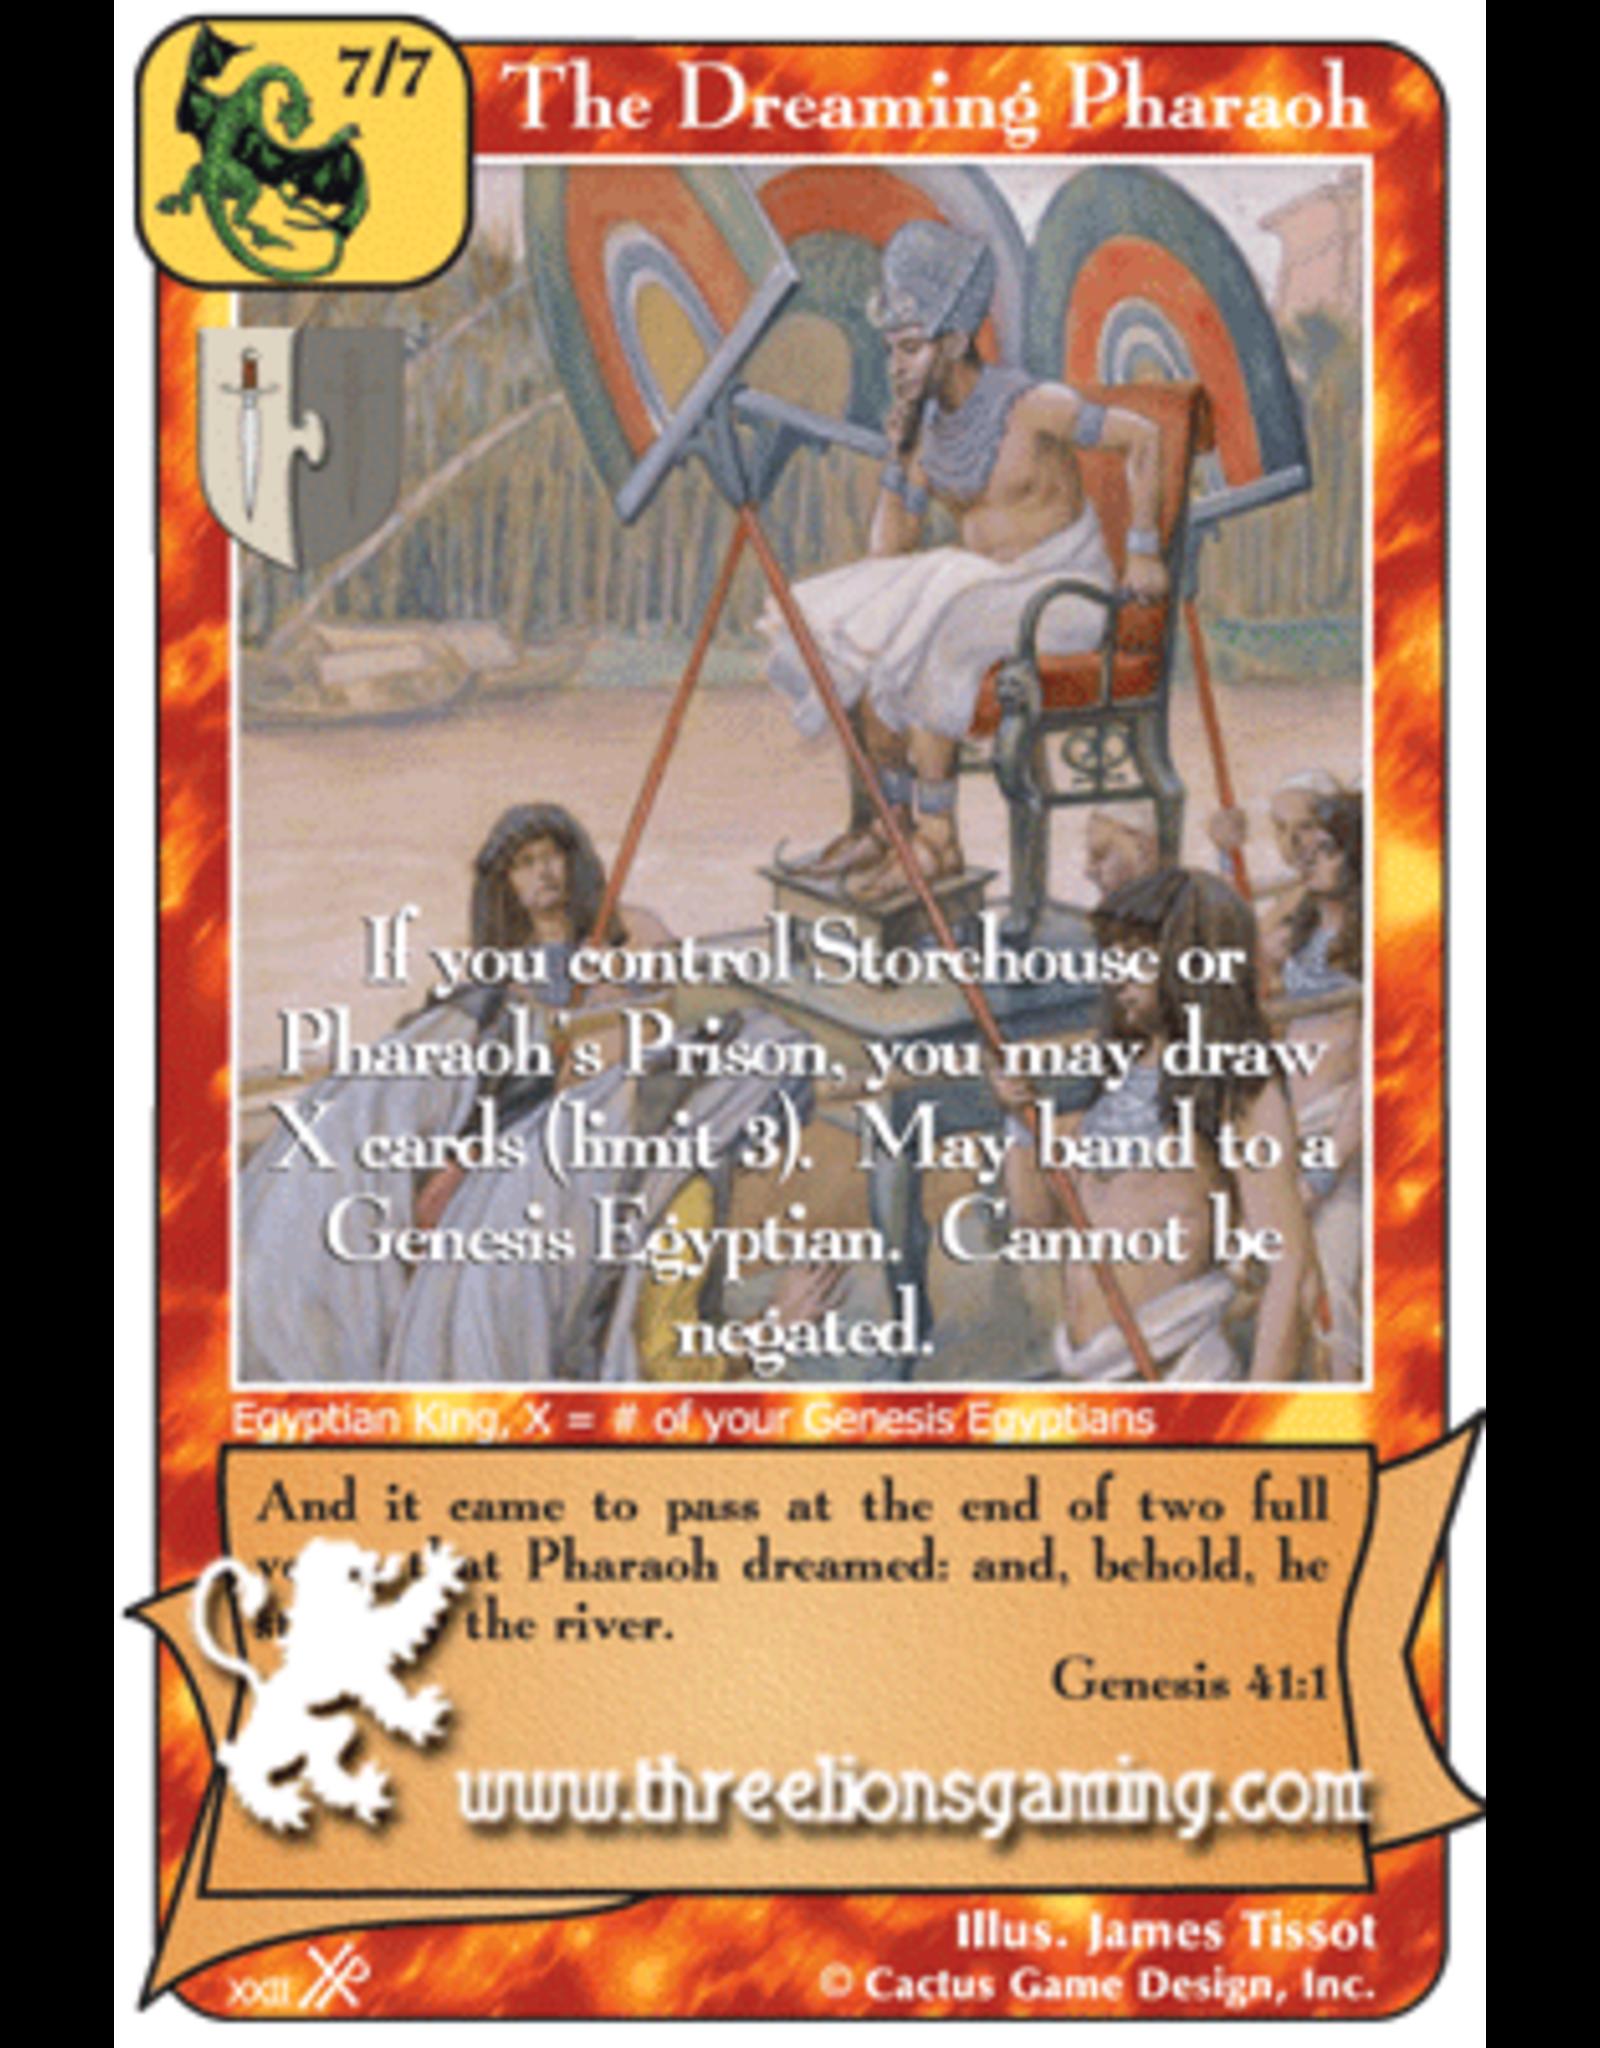 FoOF: The Dreaming Pharaoh